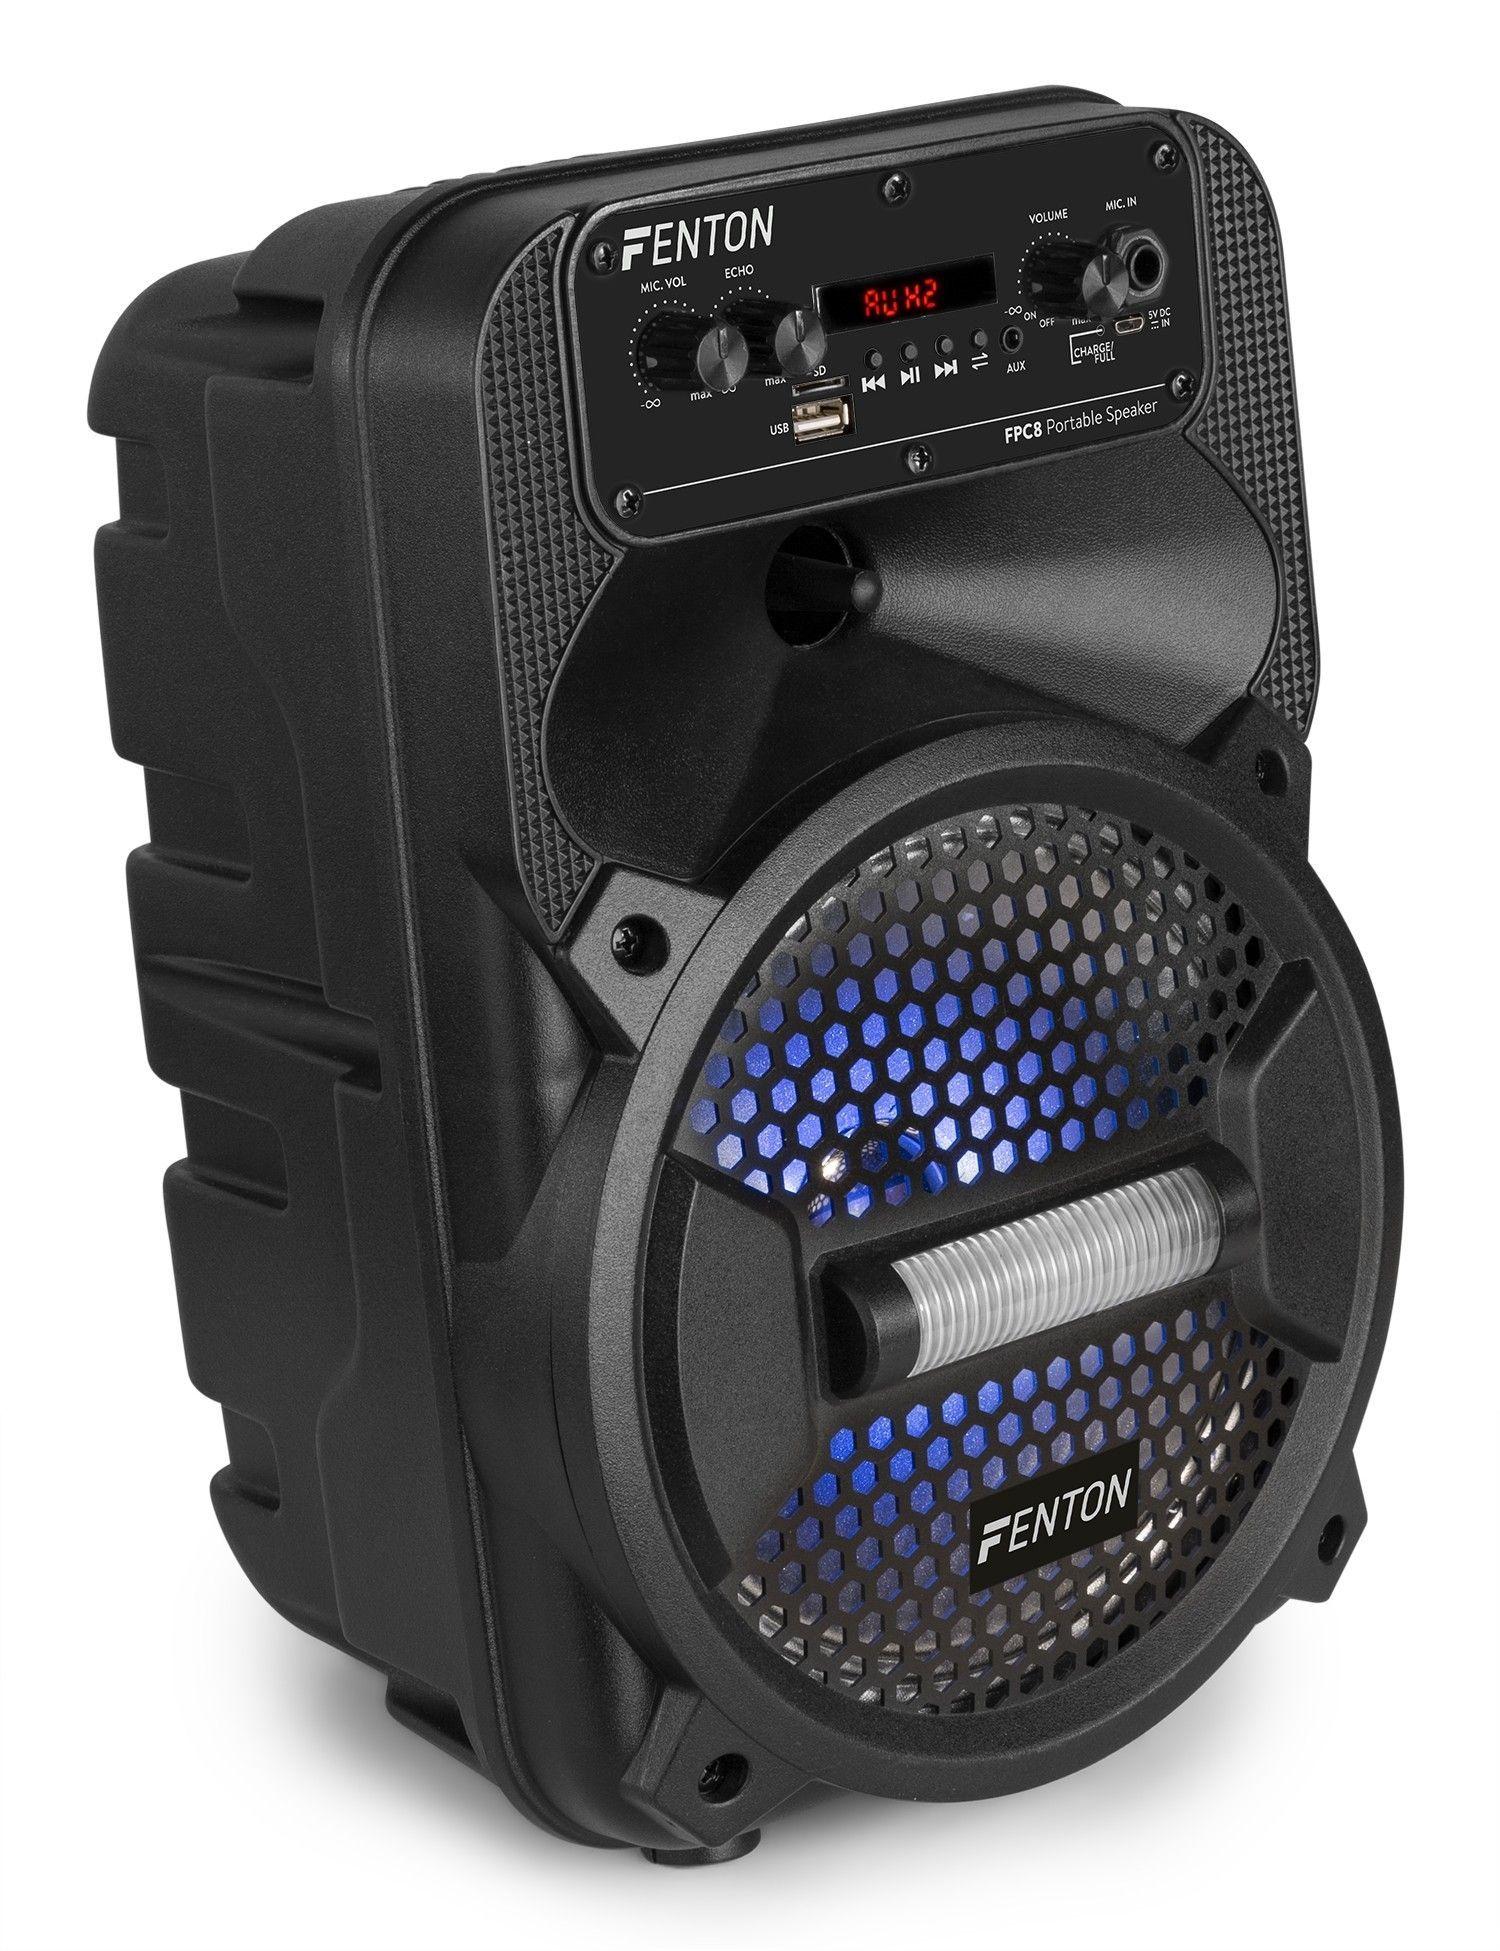 "Afbeelding van Fenton FPC8 Portable Party Speaker Rechargeable 8""..."